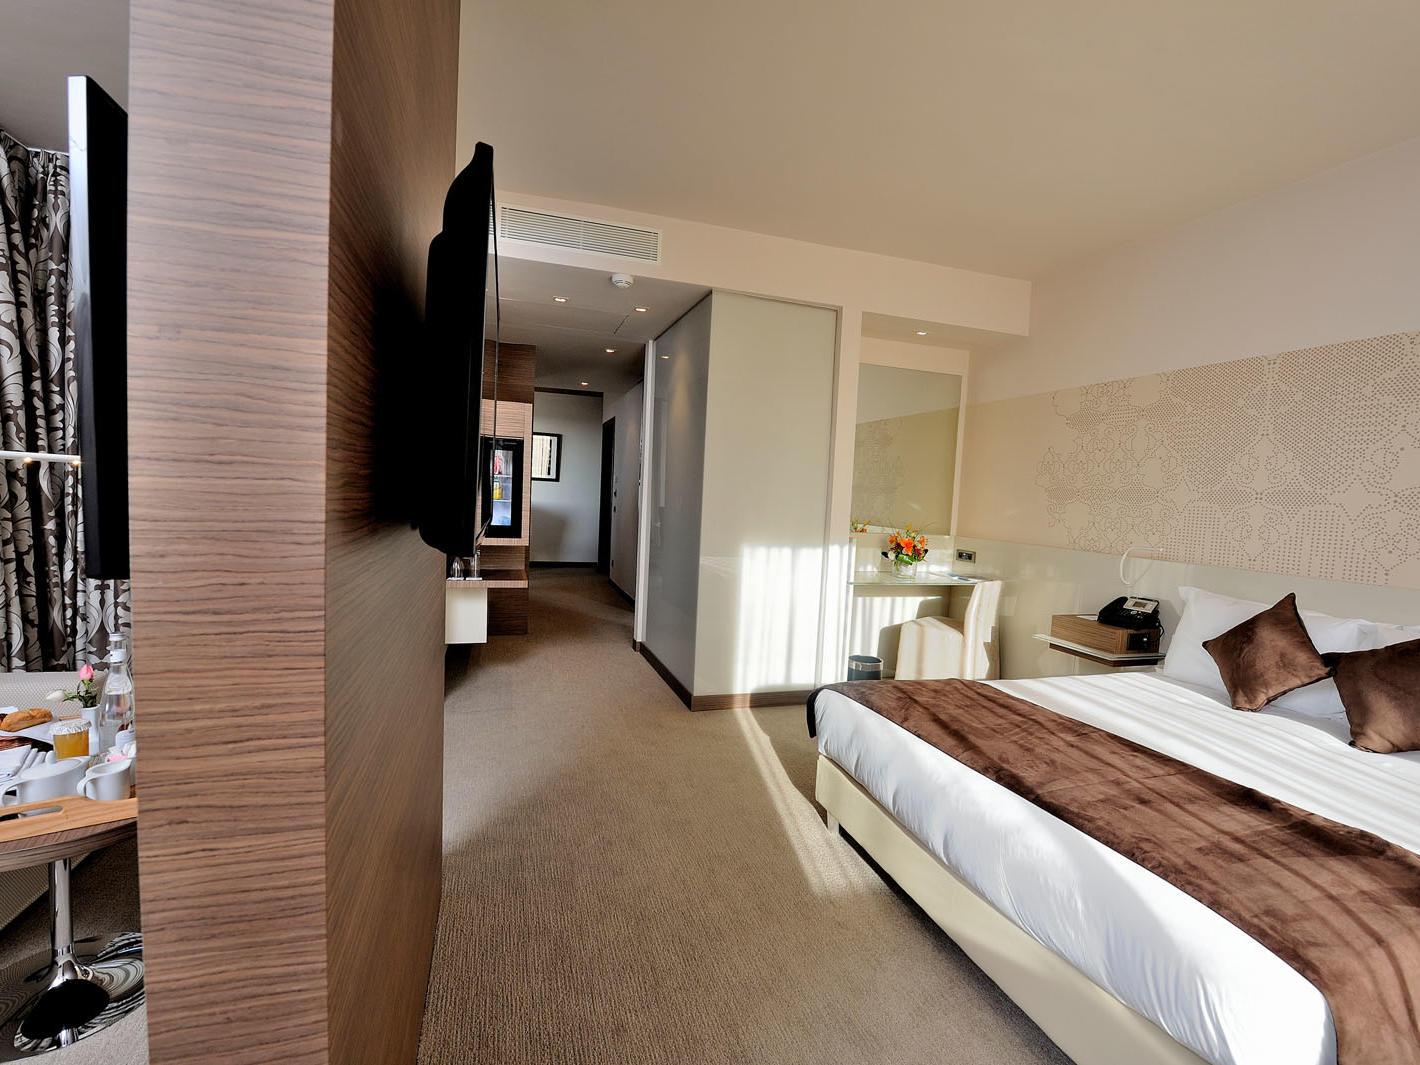 Senior Suite at Kenzi Sidi Maarouf Hotel in Casablanca, Morocco